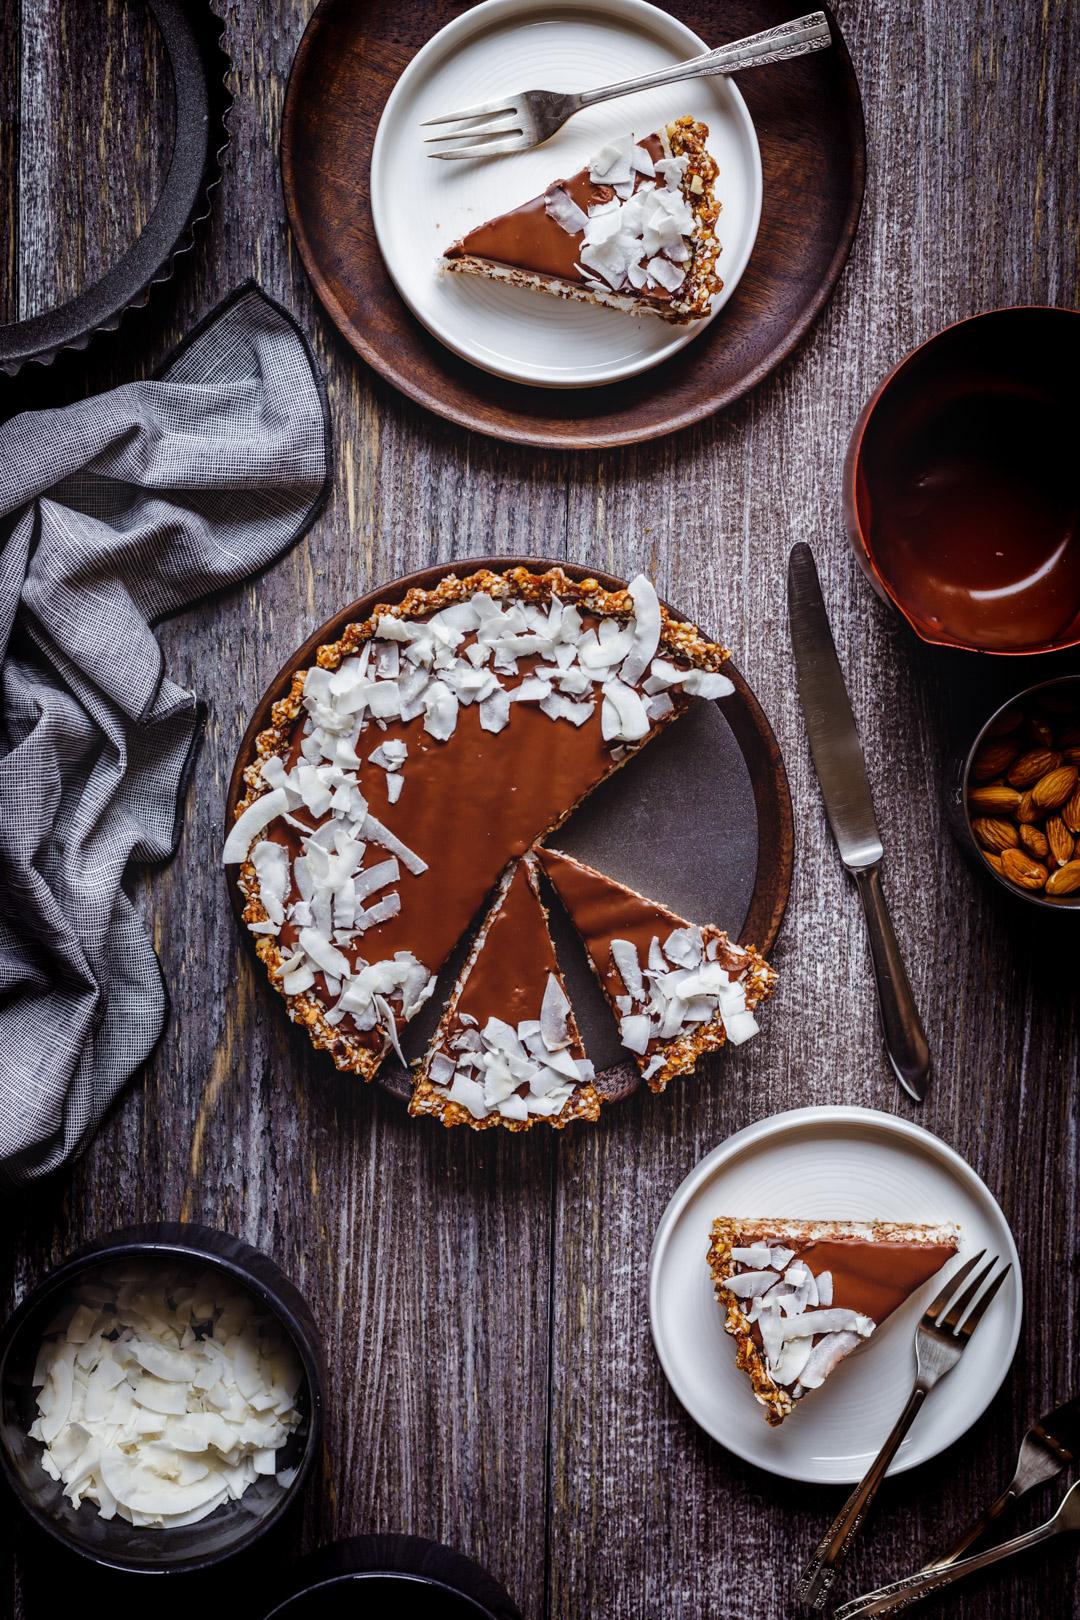 Vegan Chocolate Coconut Tart Gluten-free